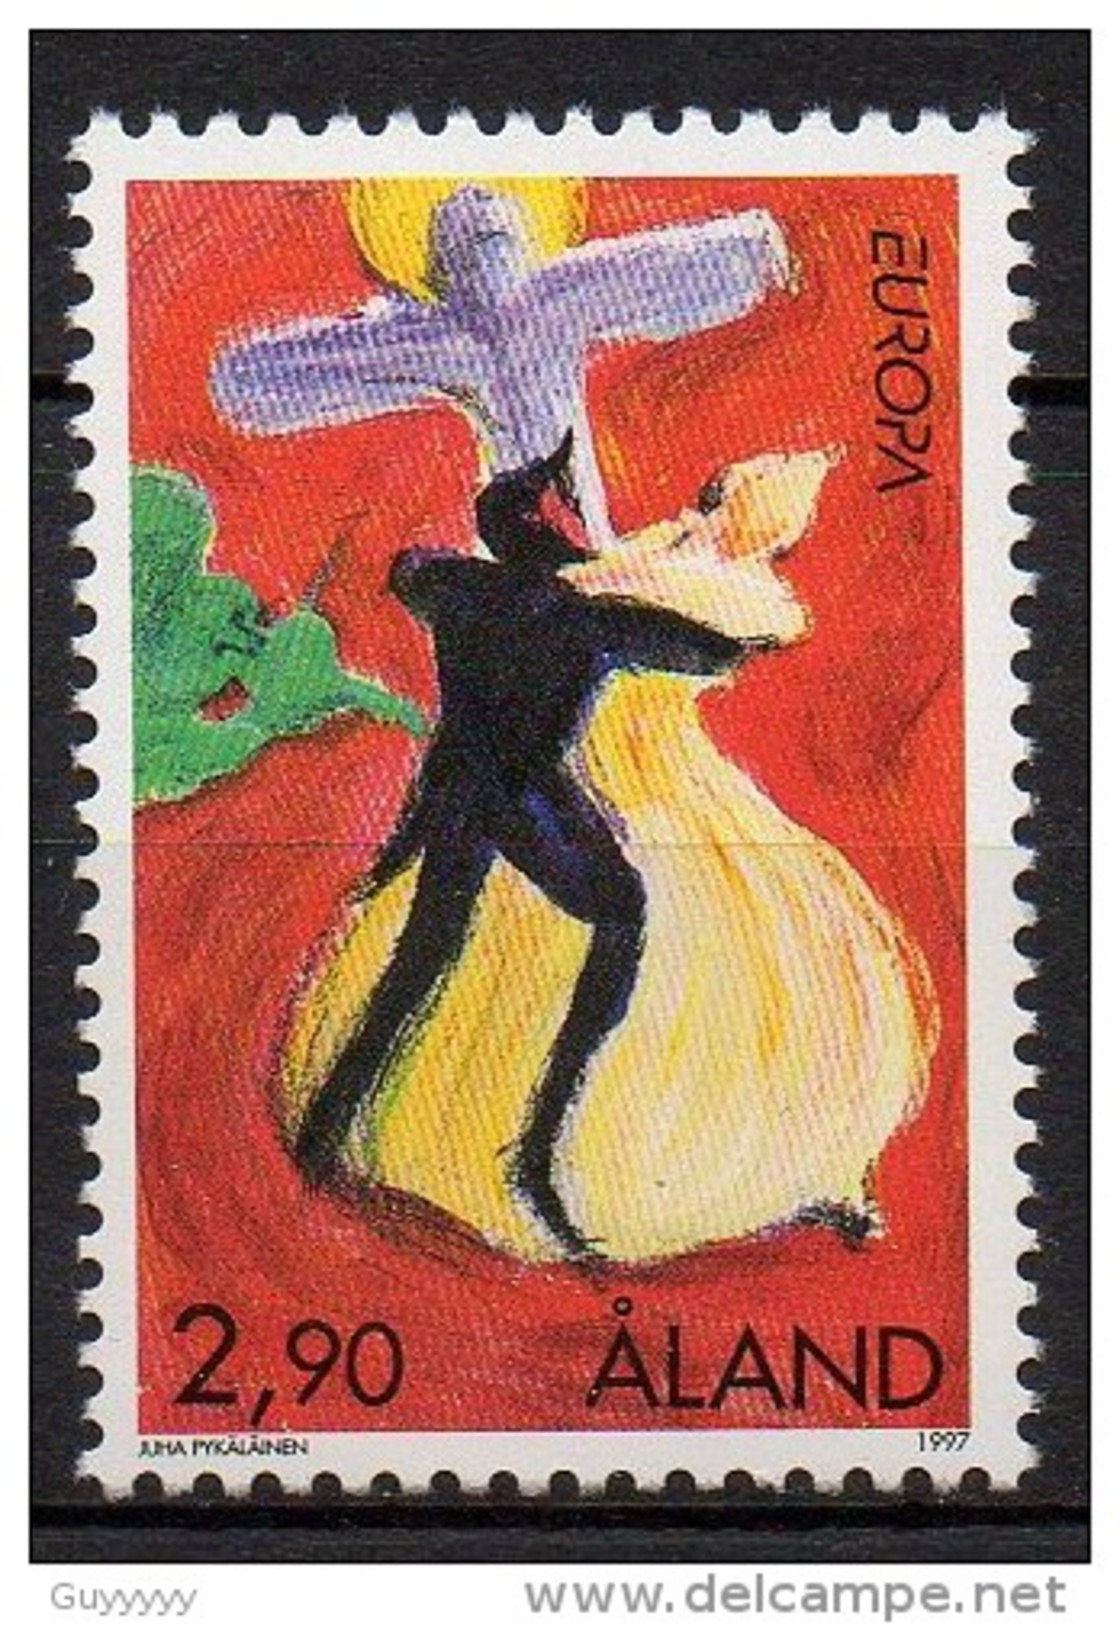 Aland - 1997 - Yvert N° 128 **  - Europa - Aland